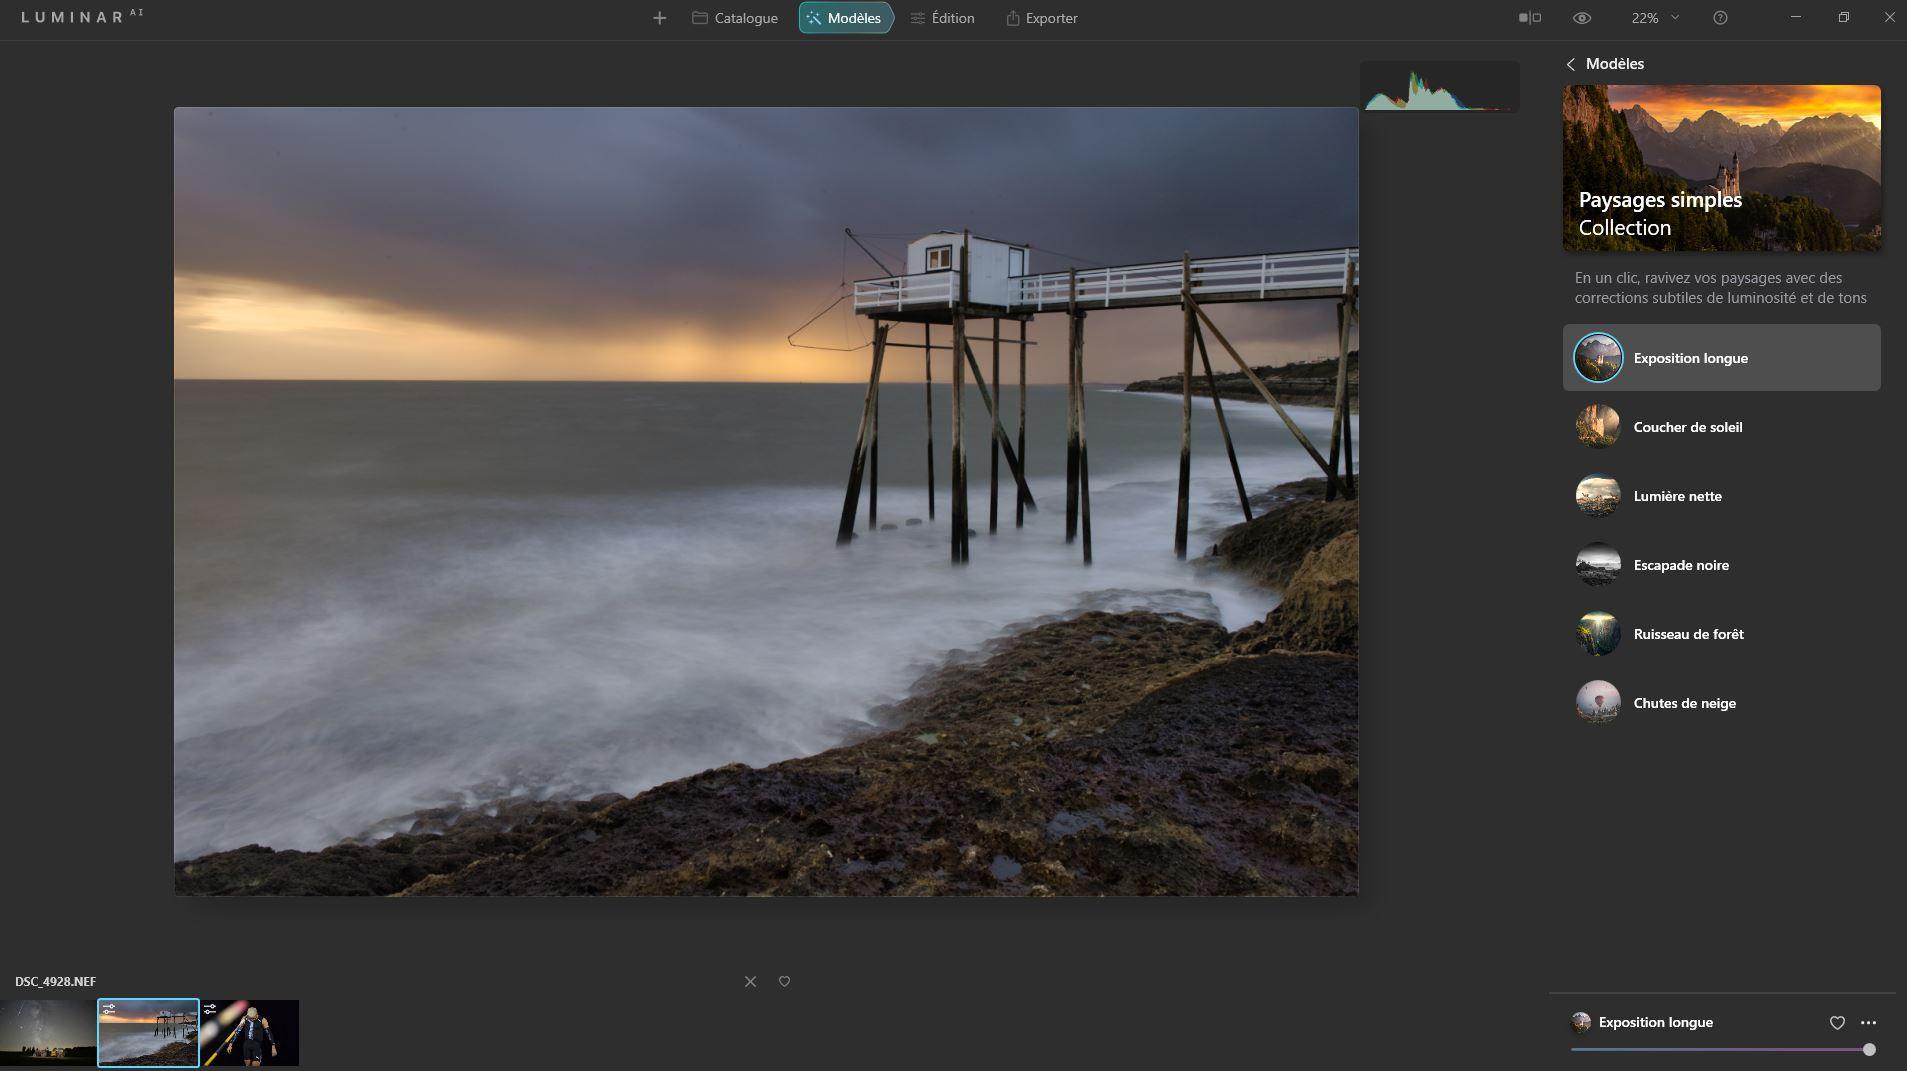 Interface logiciel photo Luminar AI